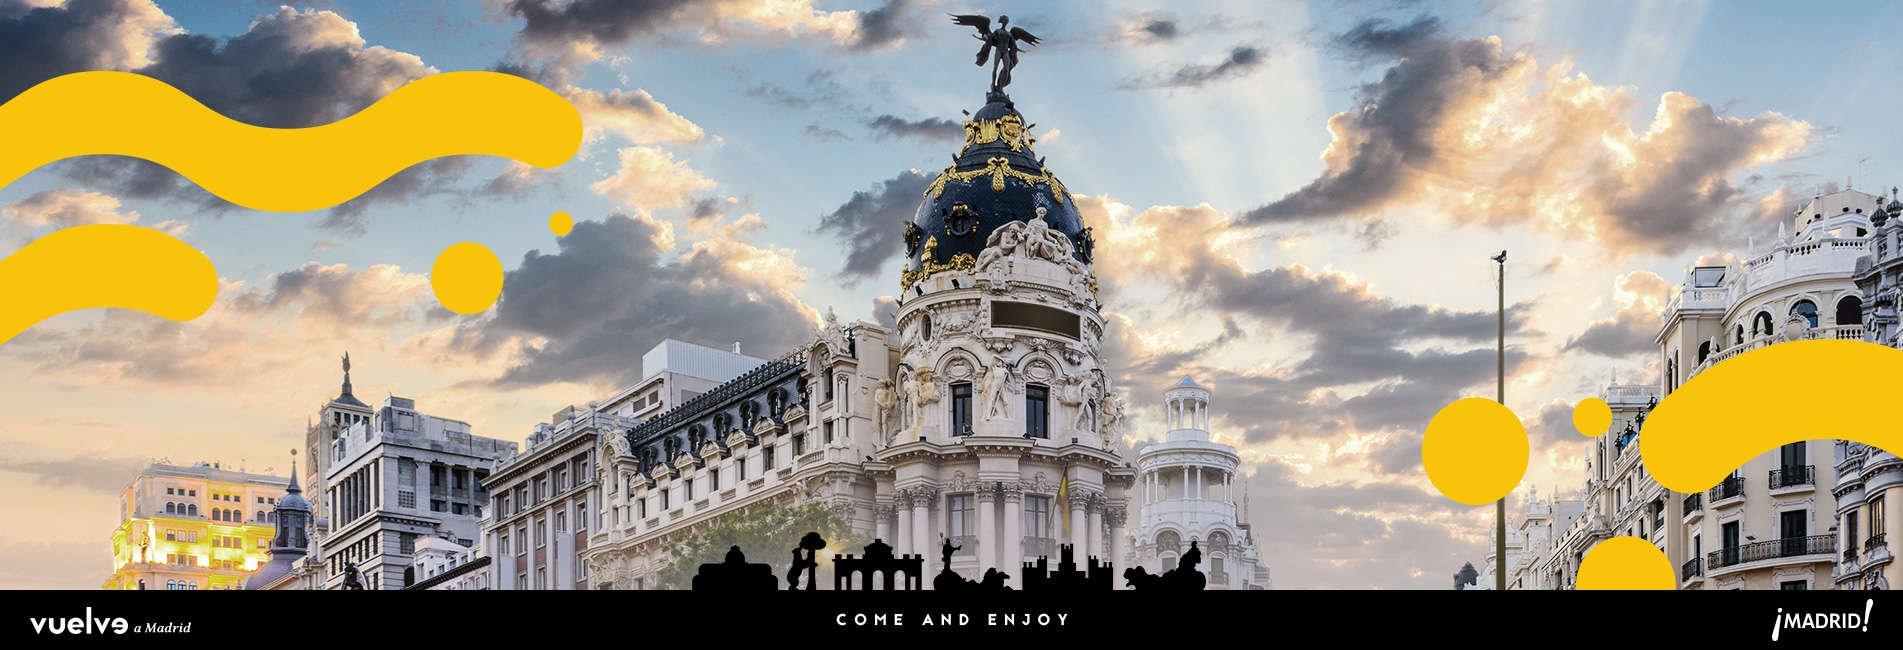 Vuelve a Madrid EN